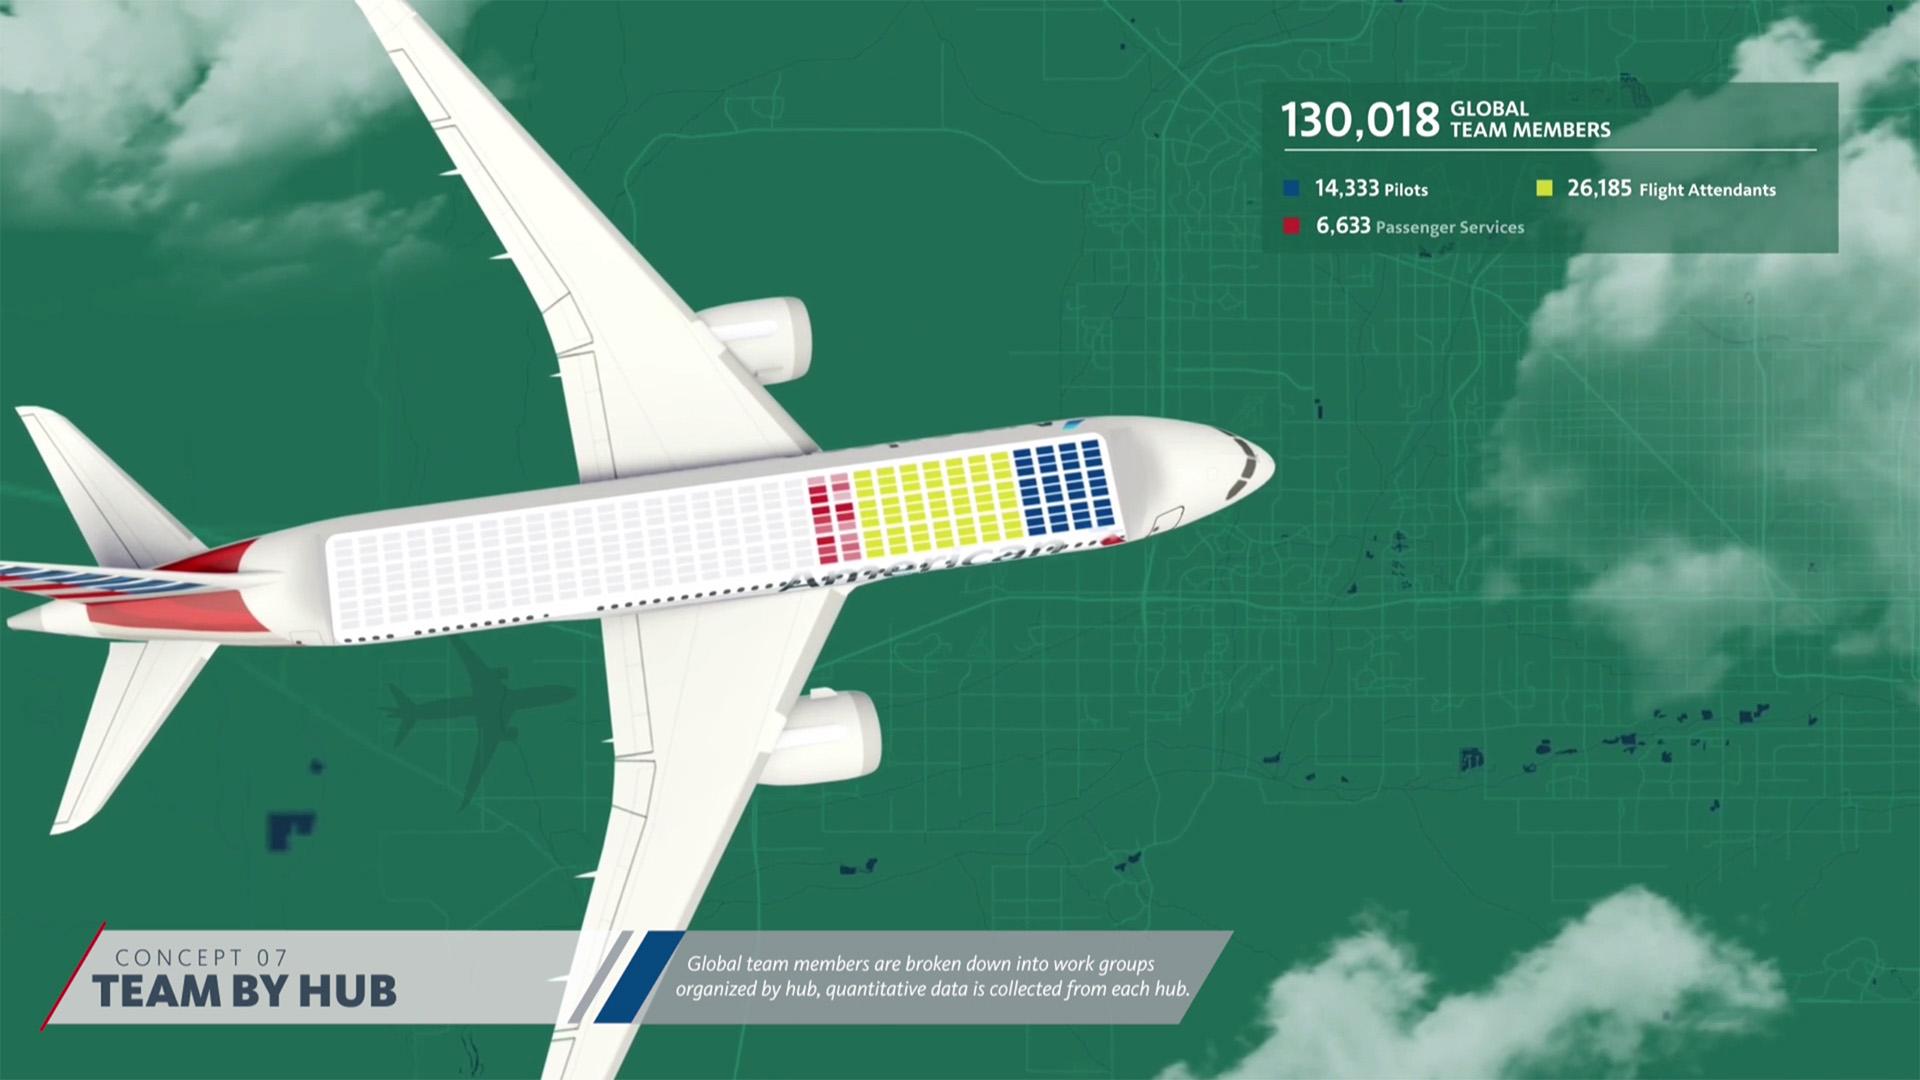 American Airlines Team by Hub